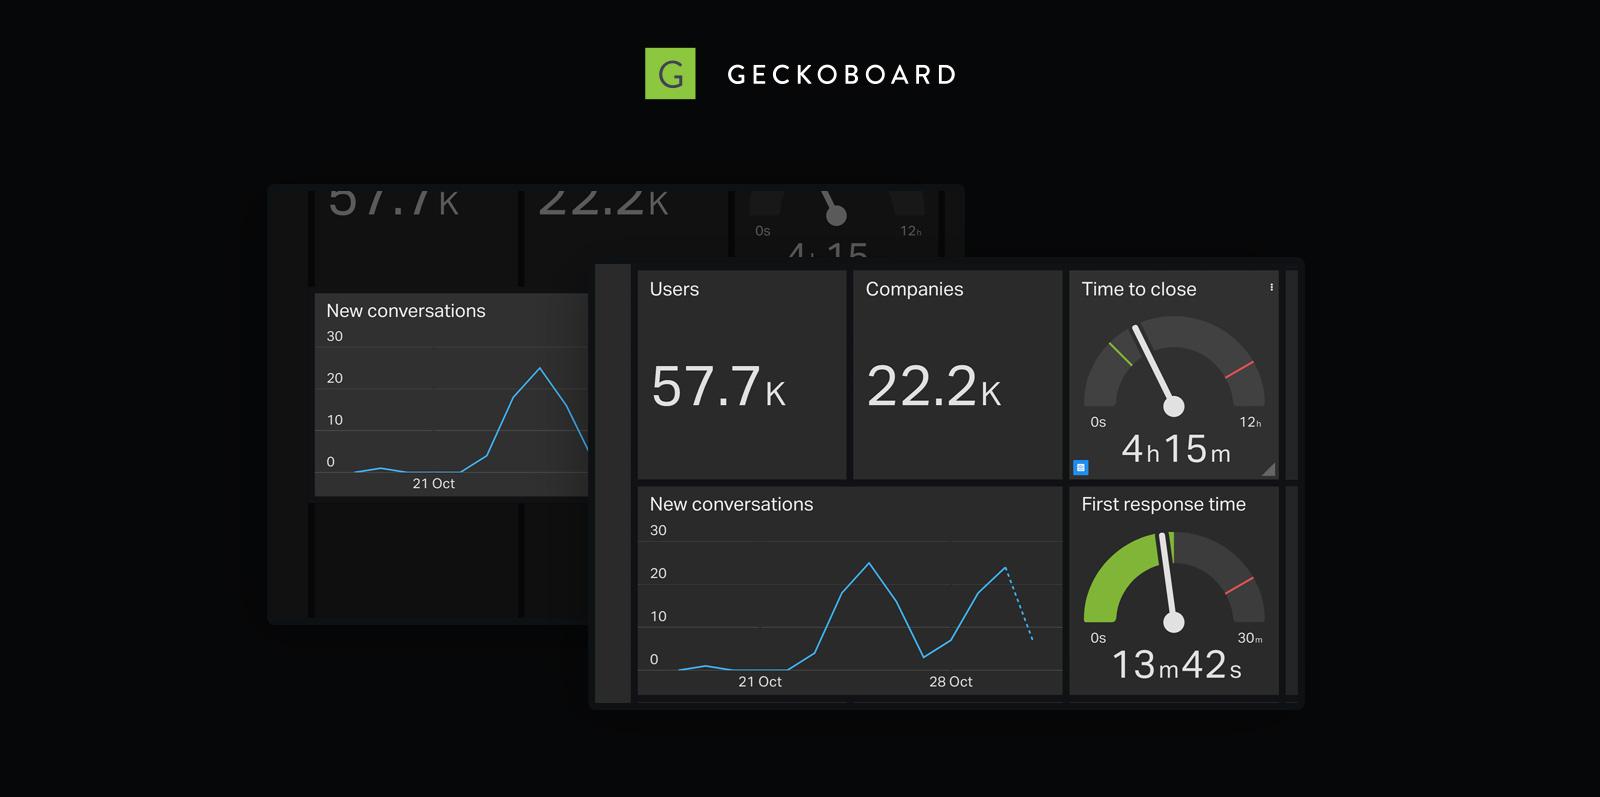 Geckoboard visualizes your Intercom data